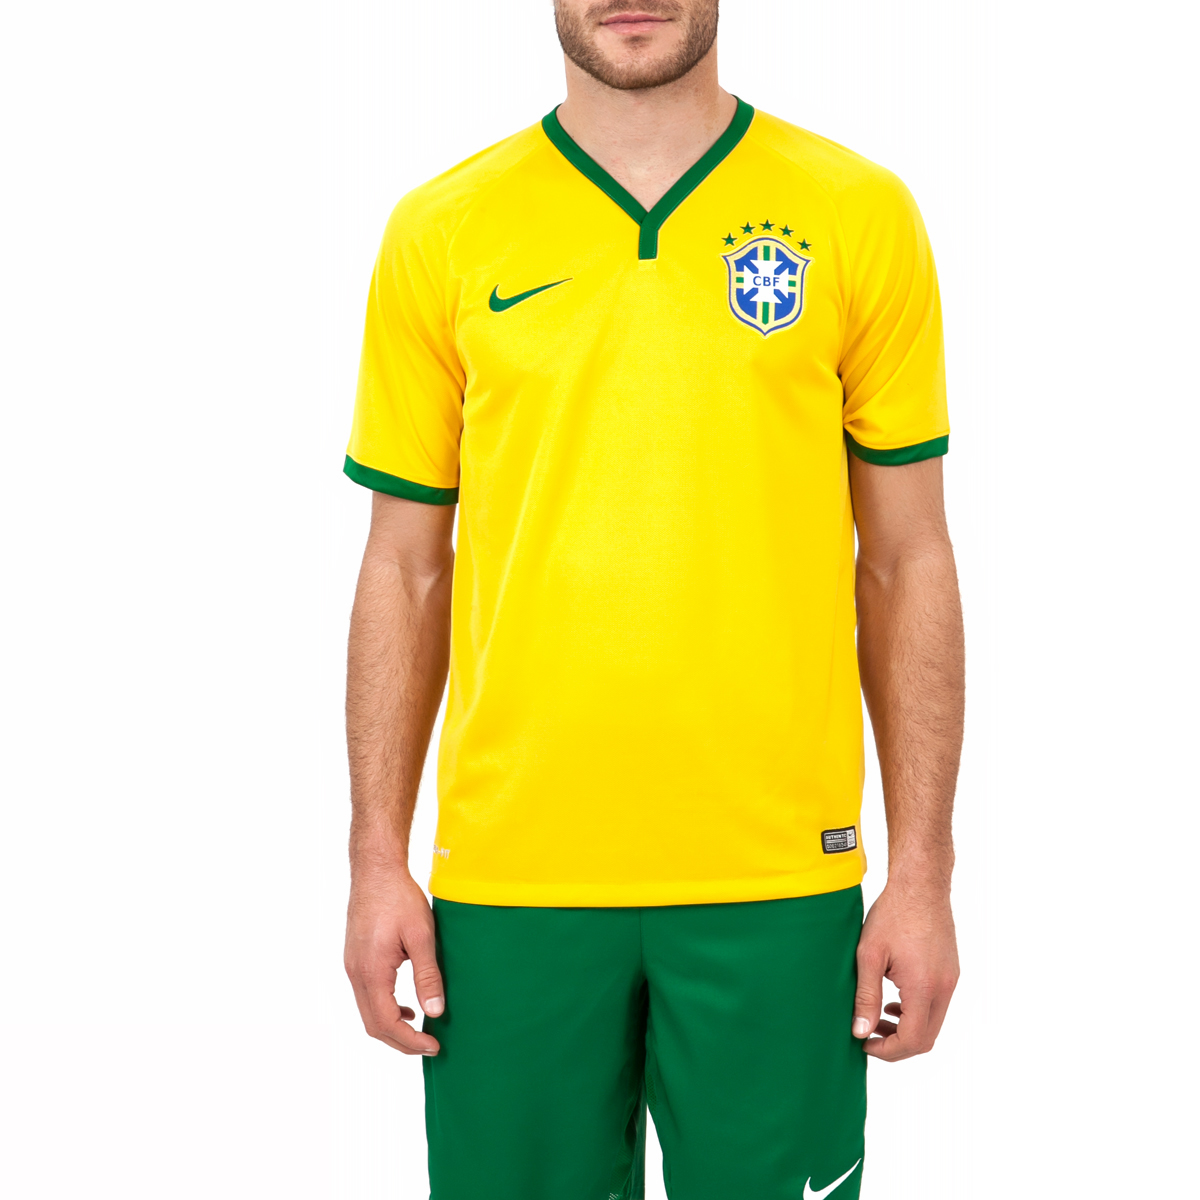 NIKE - Ανδρική μπλούζα Nike CBF κίτρινη ανδρικά ρούχα αθλητικά t shirt